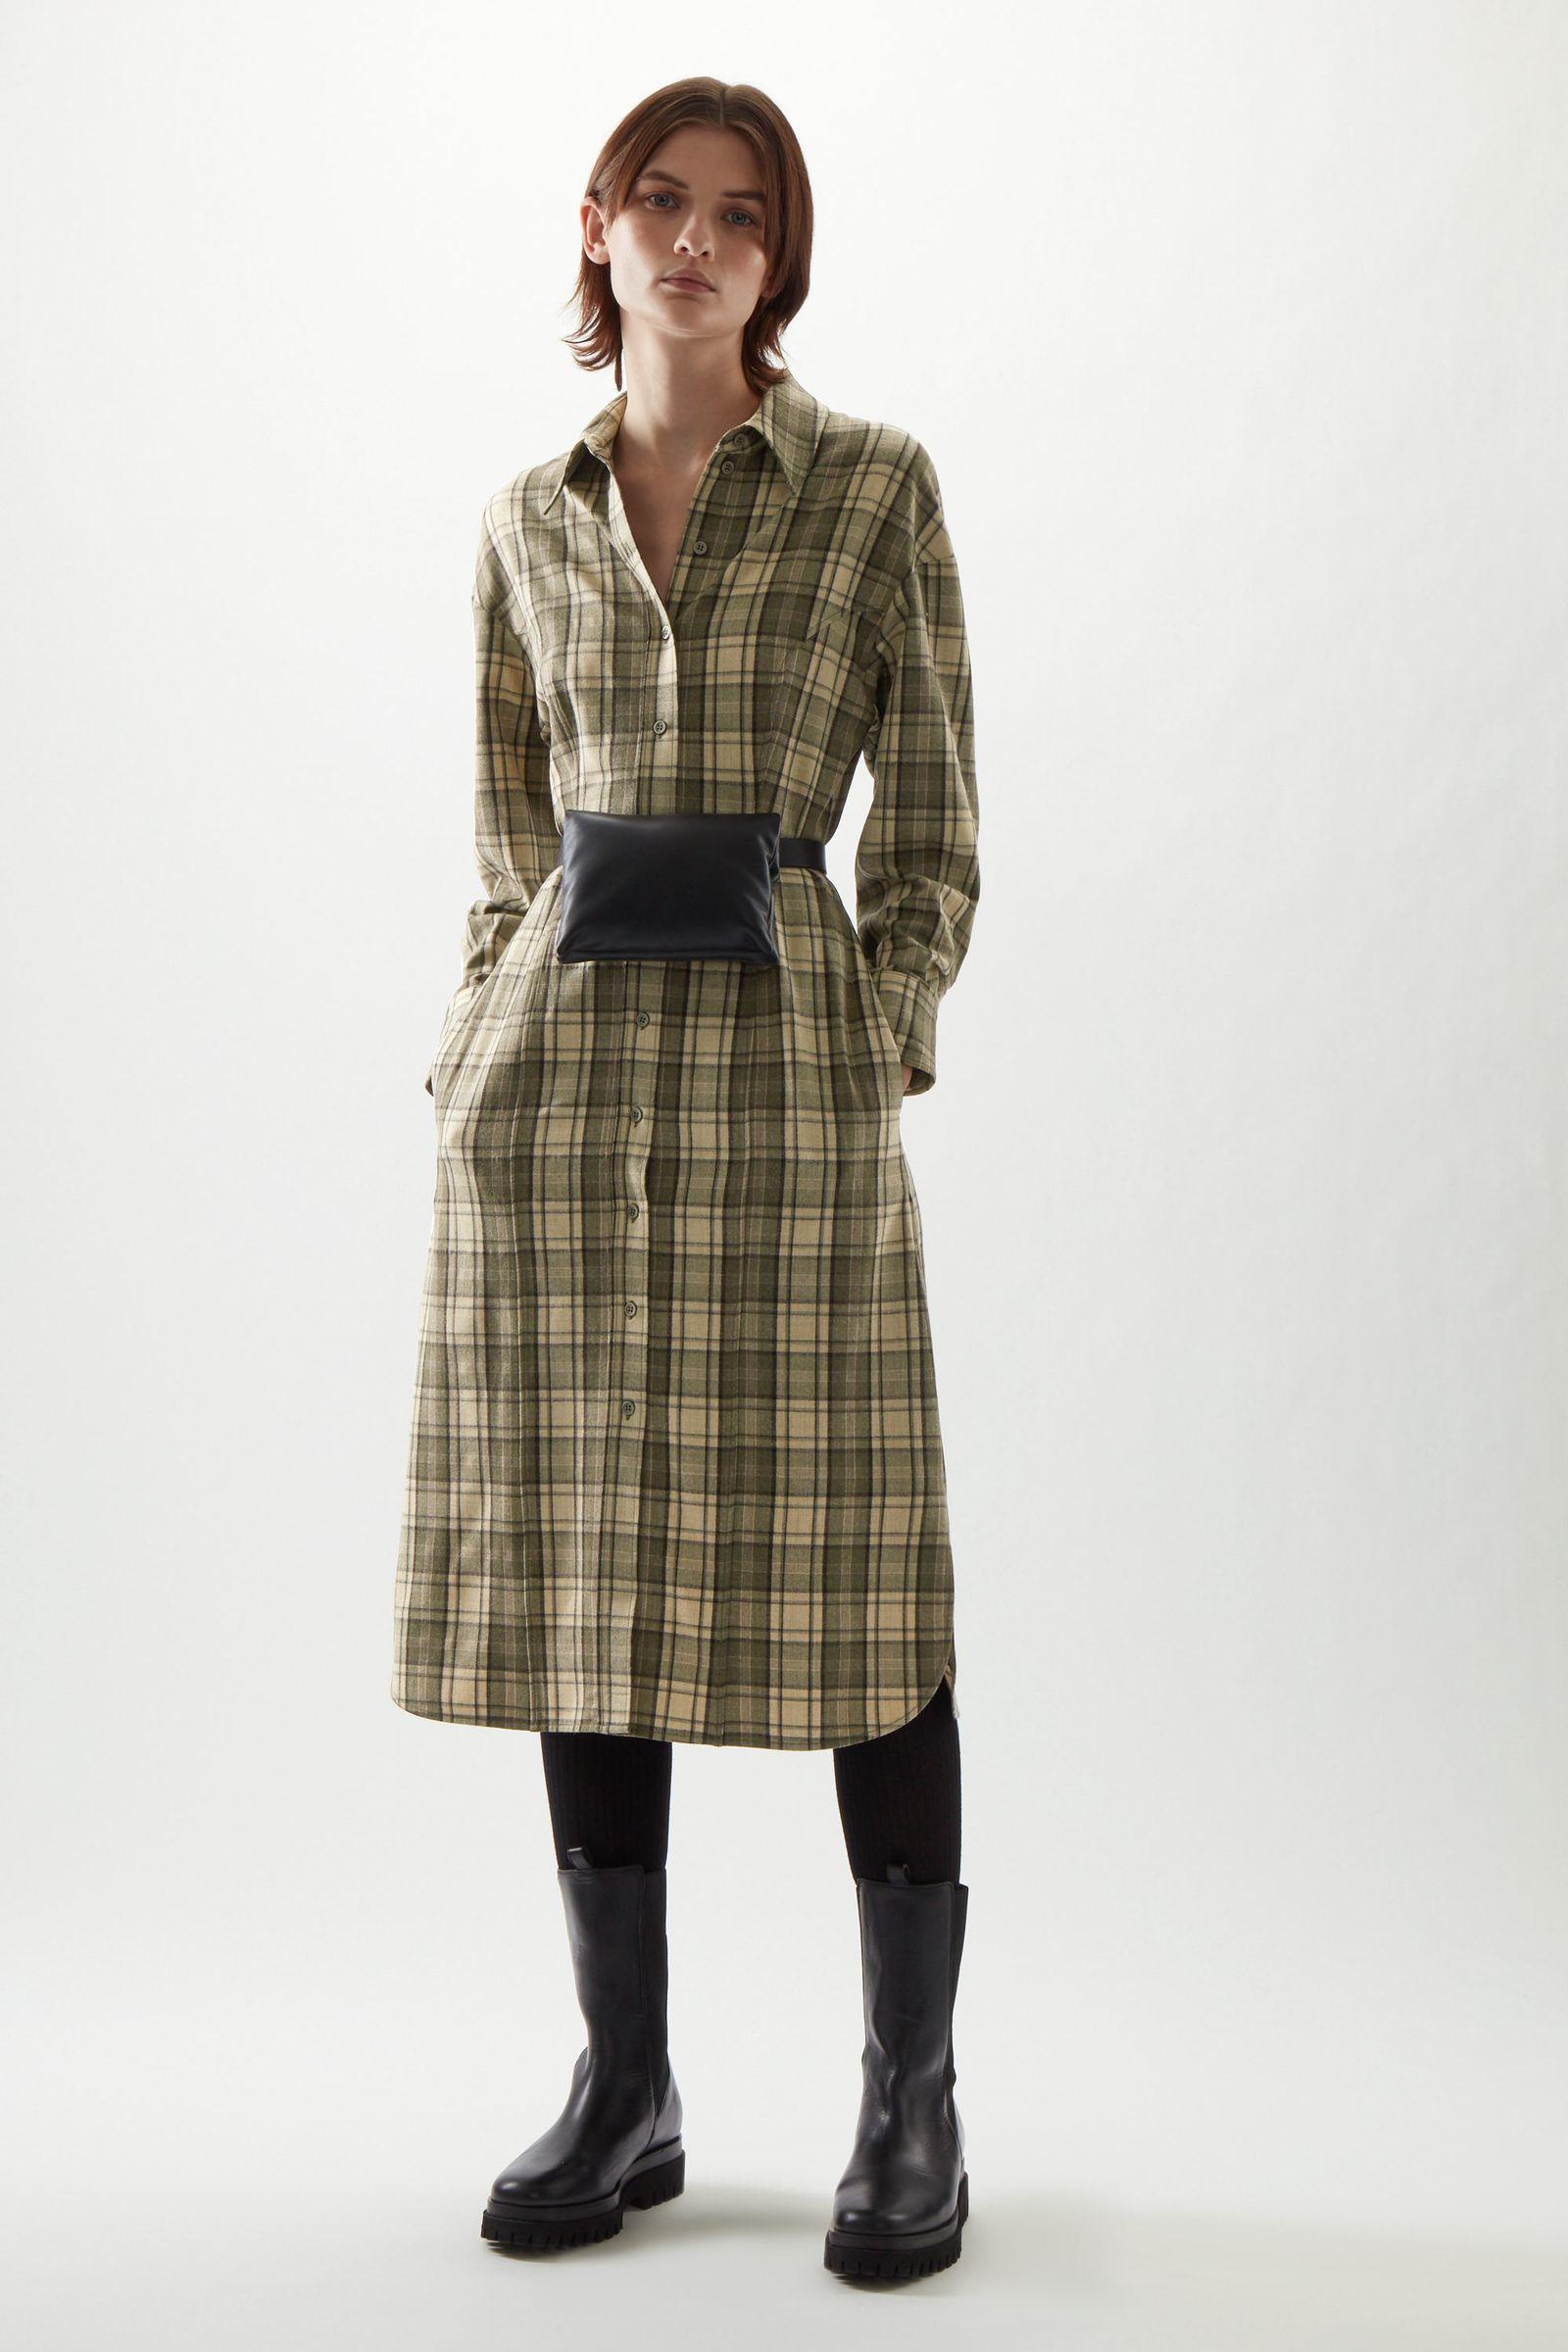 COS 울 믹스 체크 스트럭처드 셔츠 드레스의 베이지 / 브라운컬러 ECOMLook입니다.